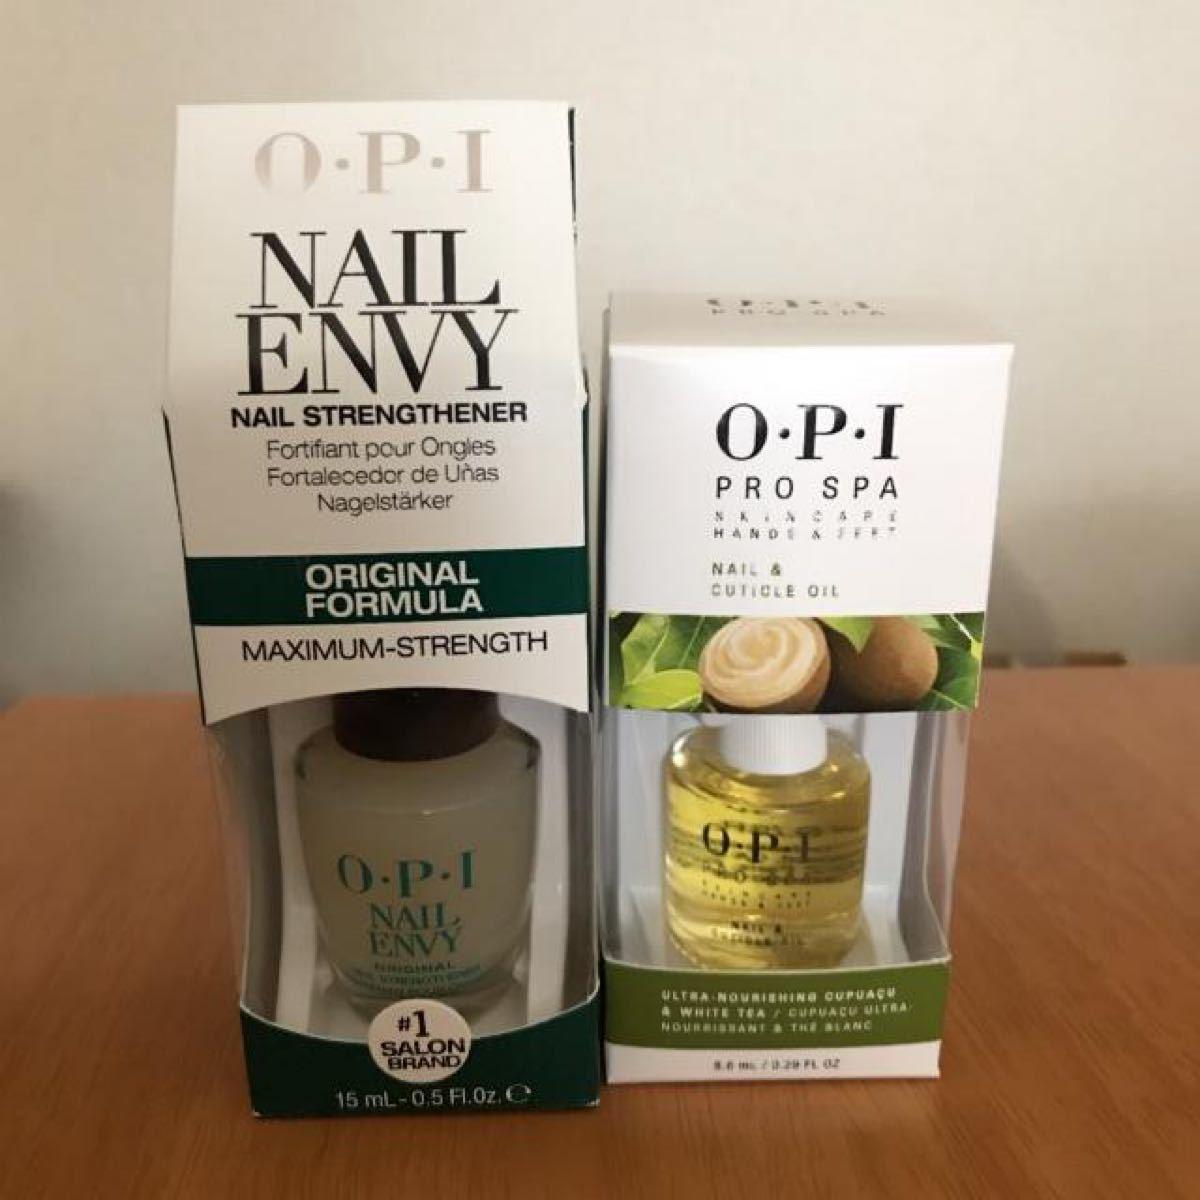 OPI ネイルエンビー & キューティクルオイル 2個セット ☆新品☆